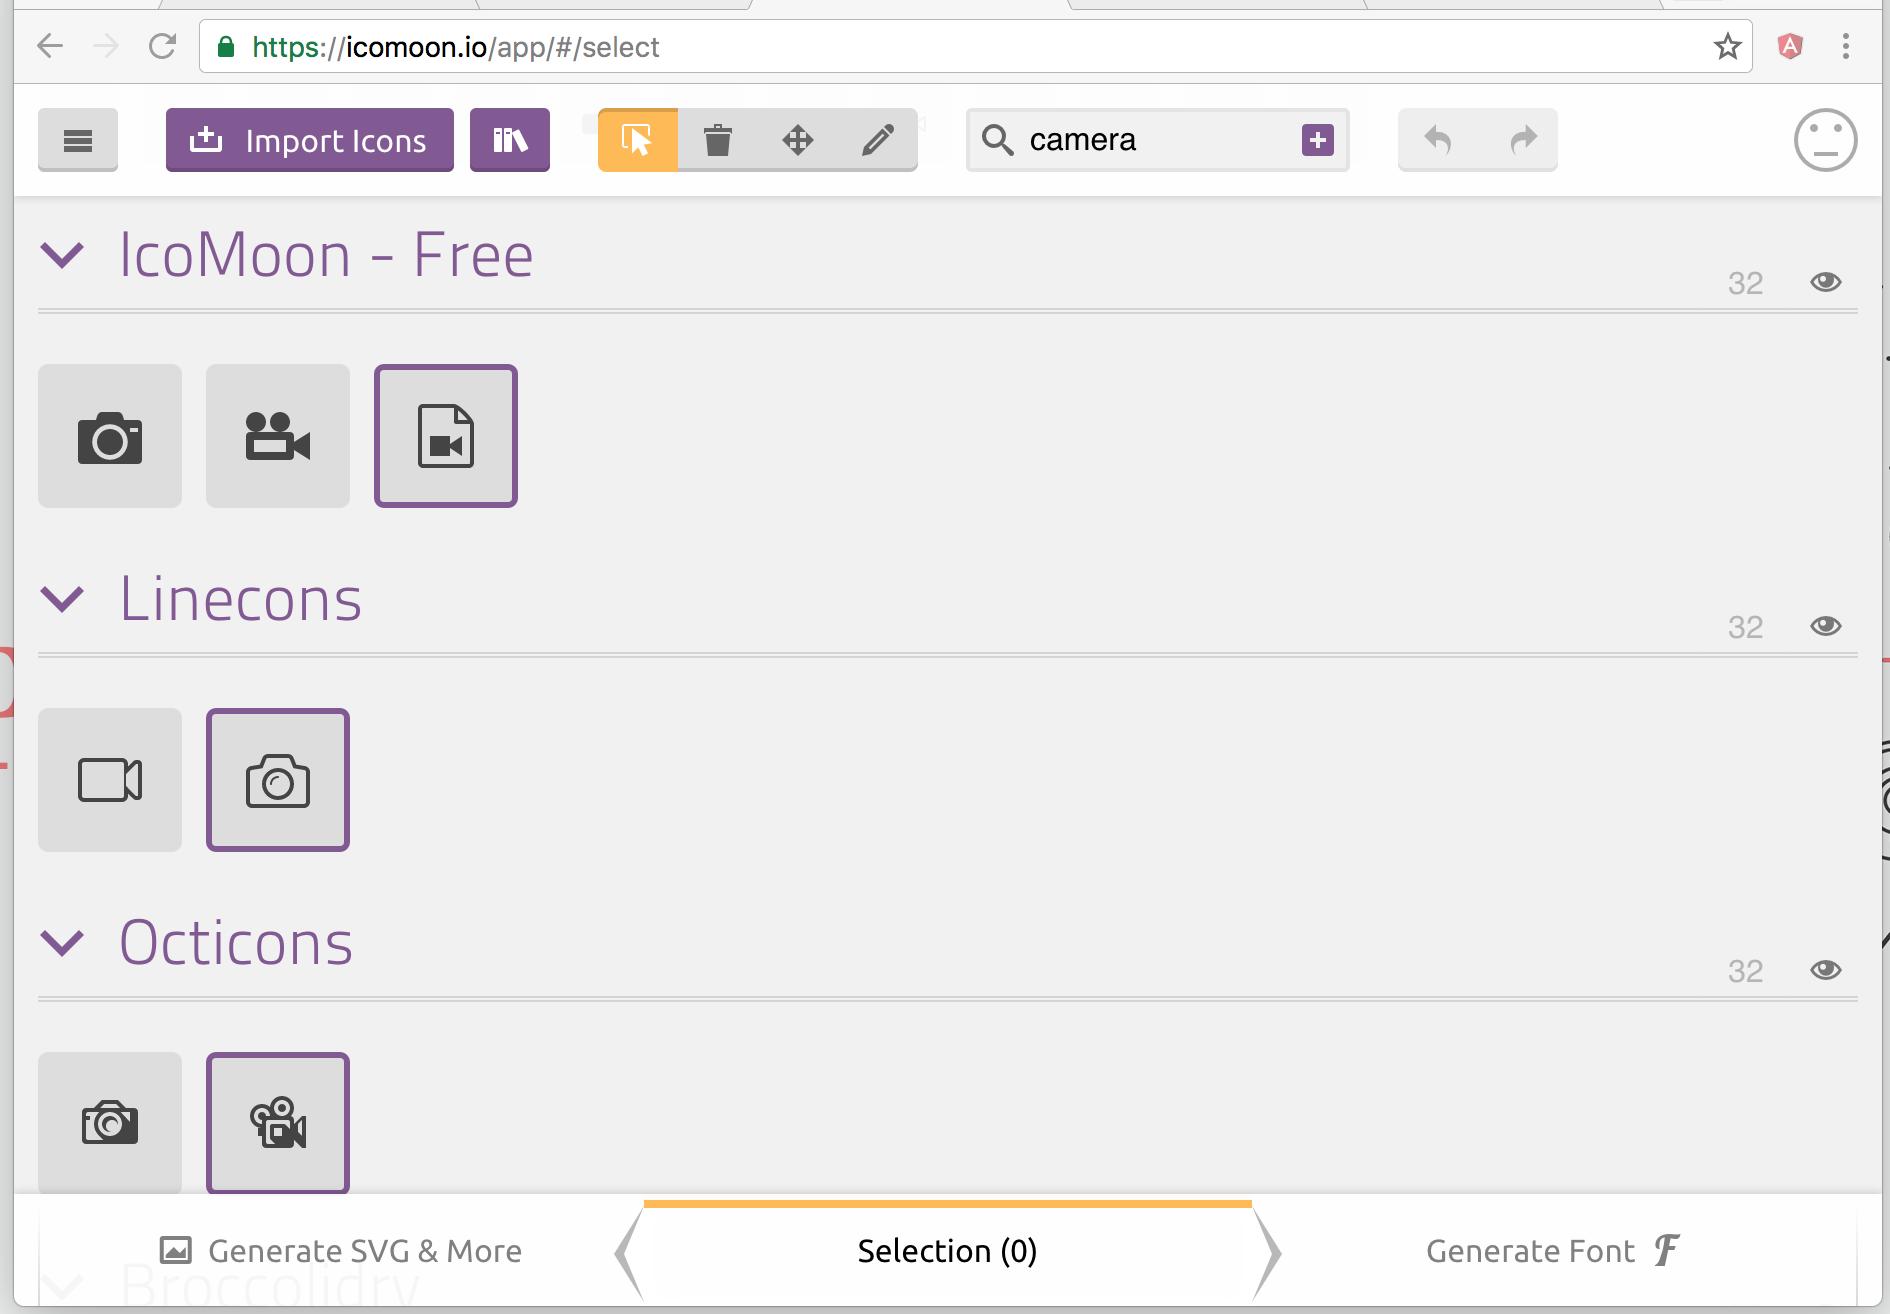 IcoMoon Application